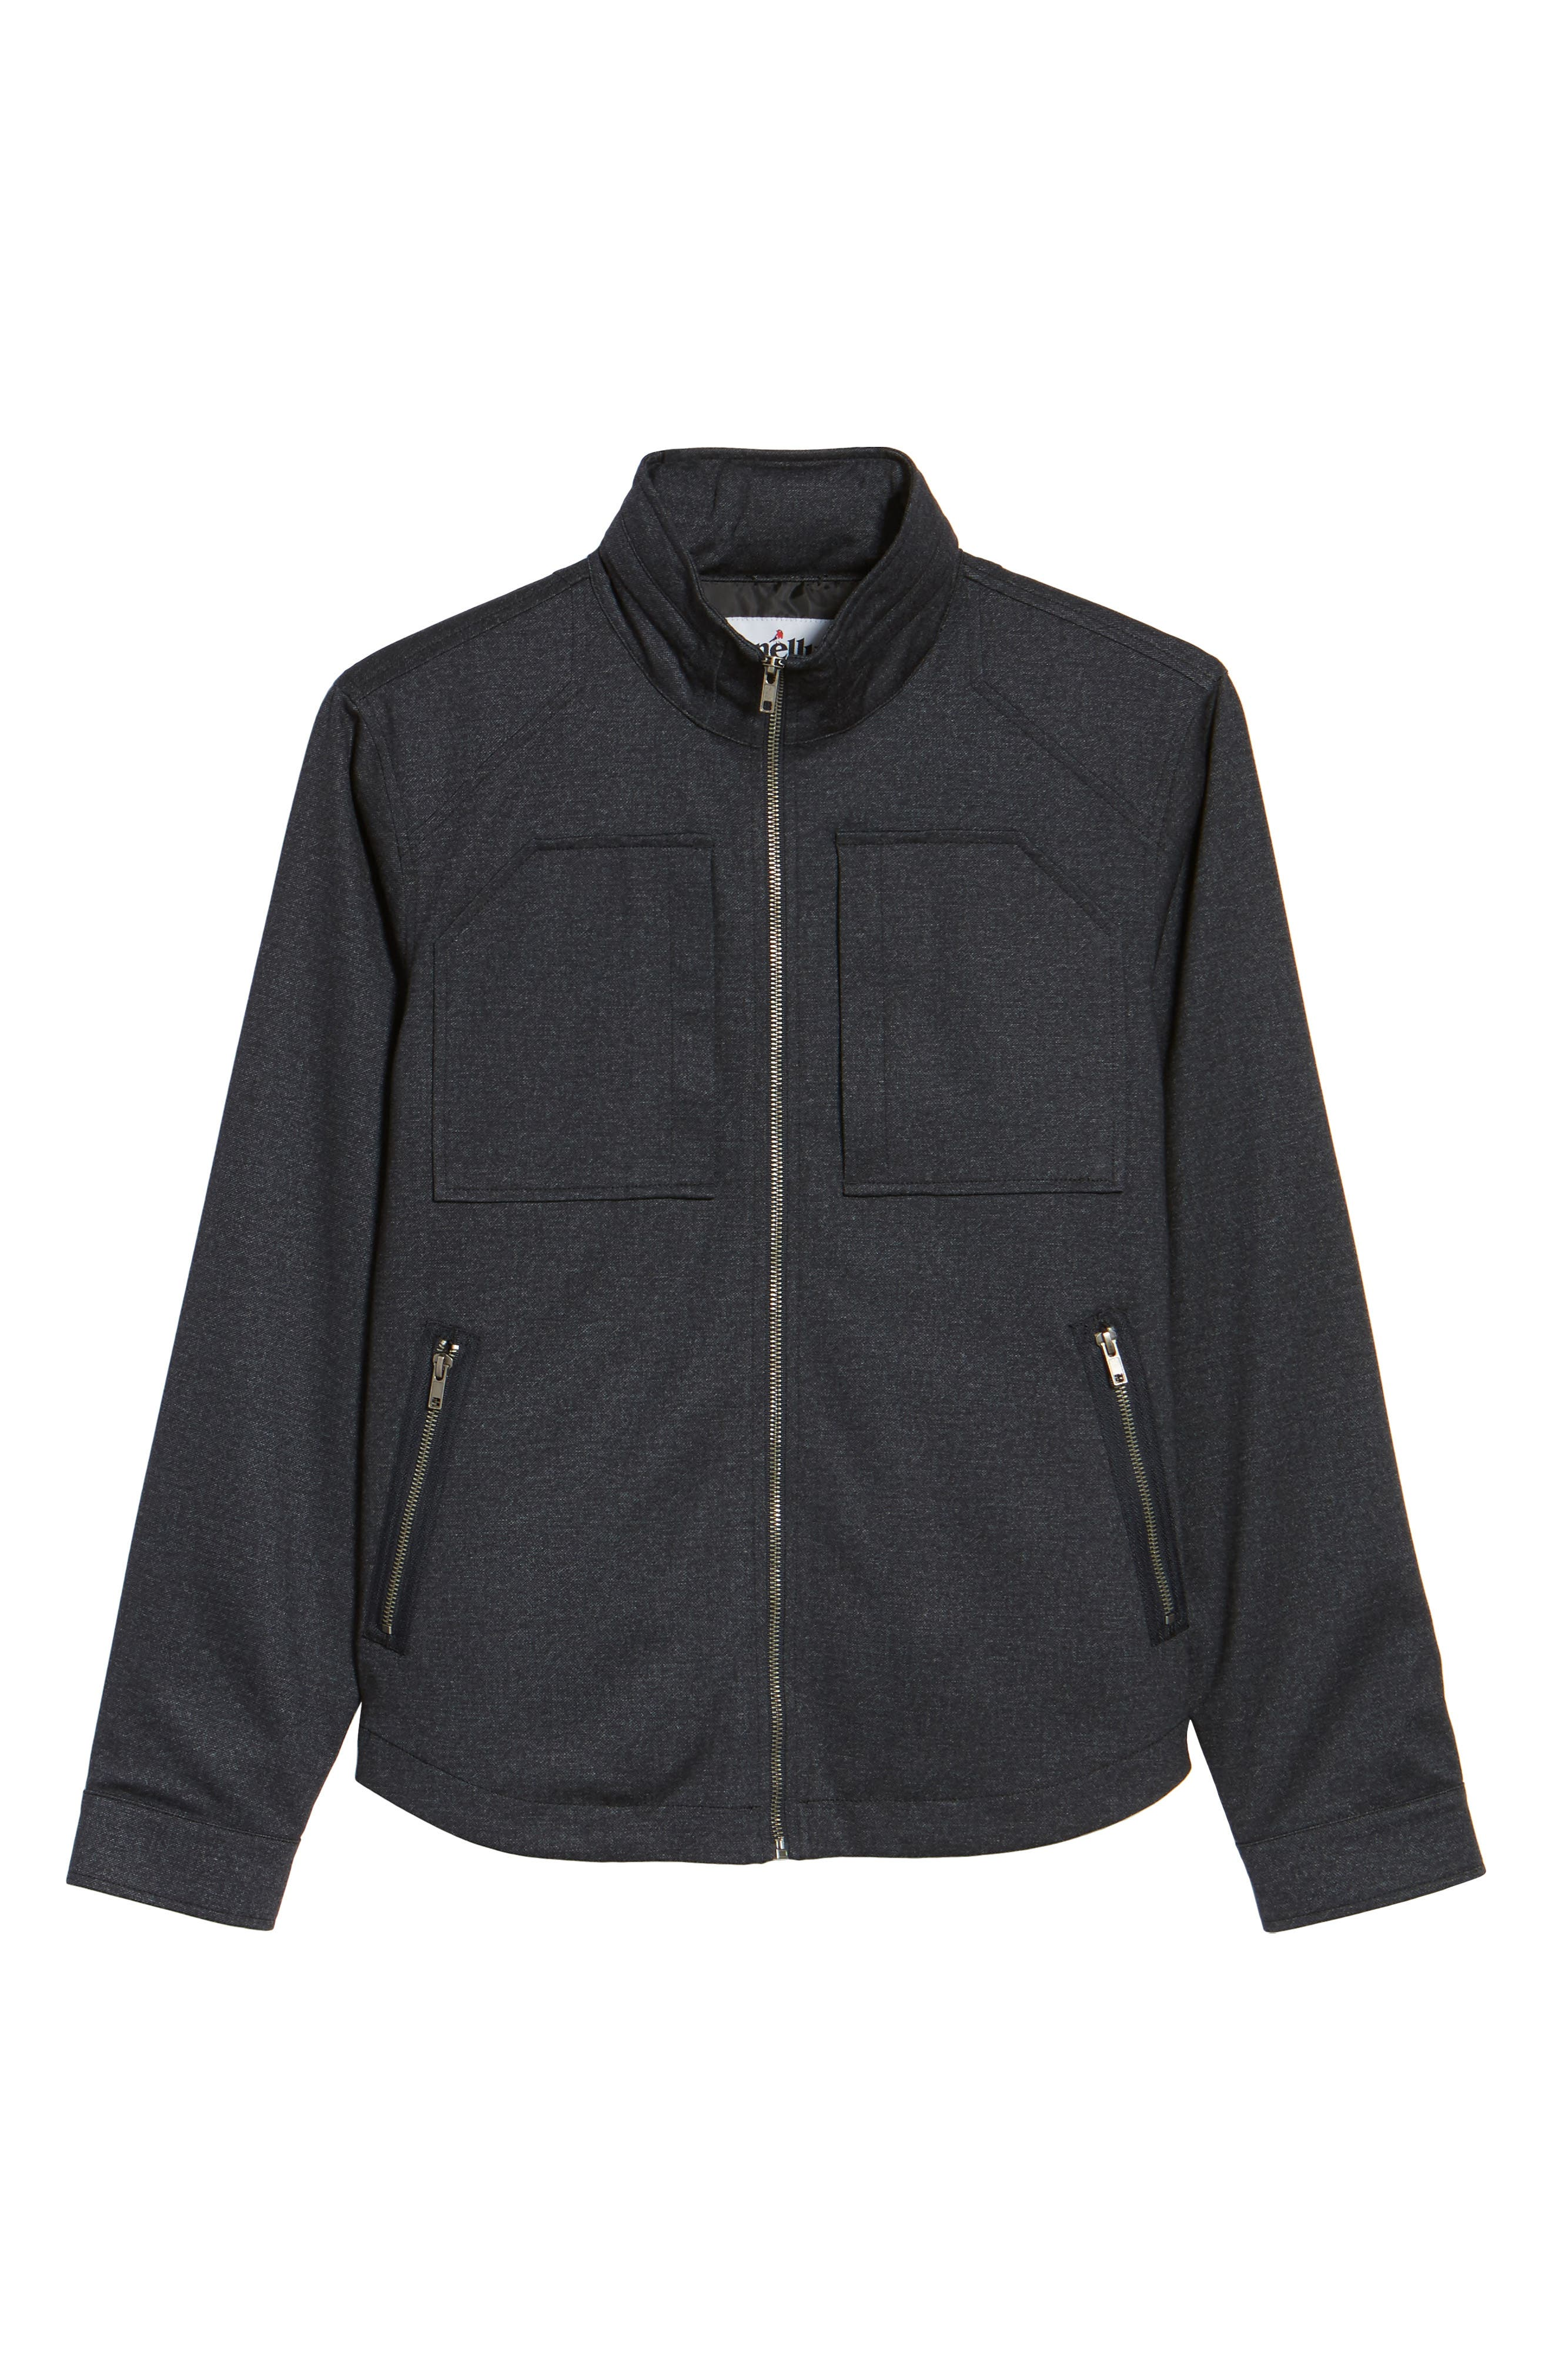 Zip Jacket,                             Alternate thumbnail 5, color,